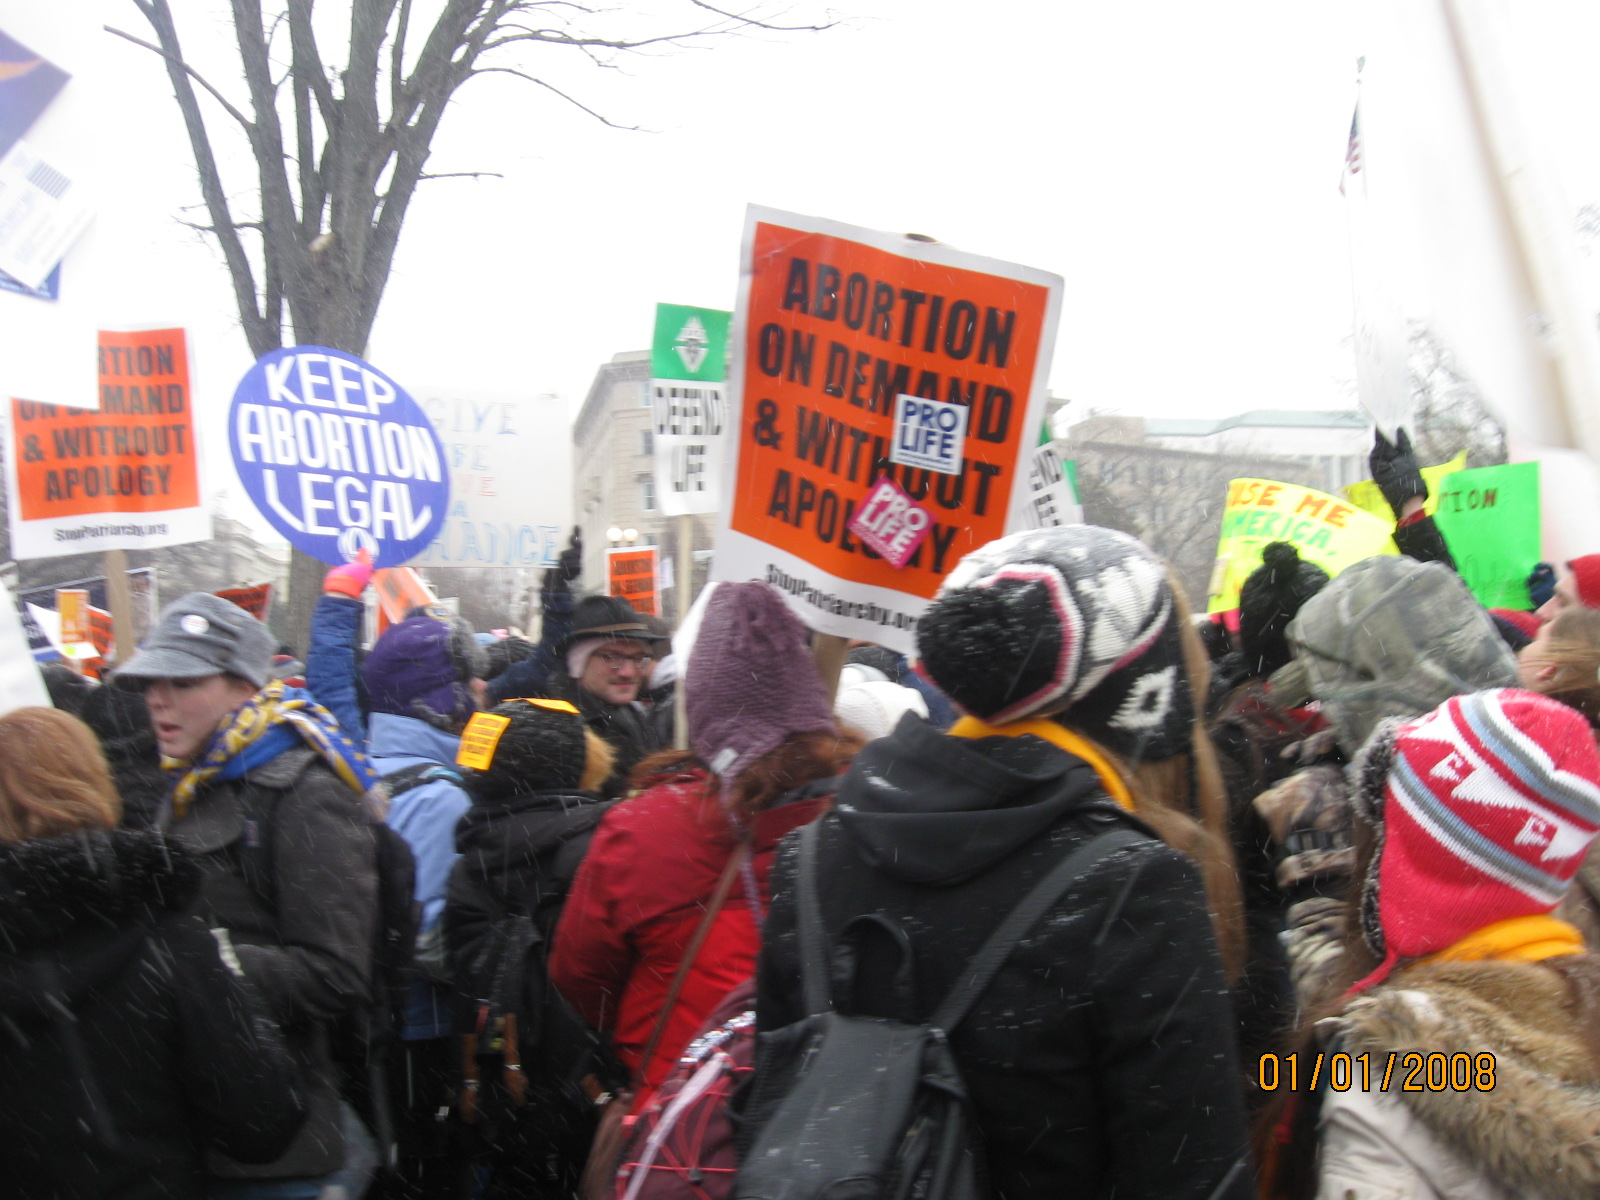 half-million-pro-lifers-meet-20-pro-abortionists